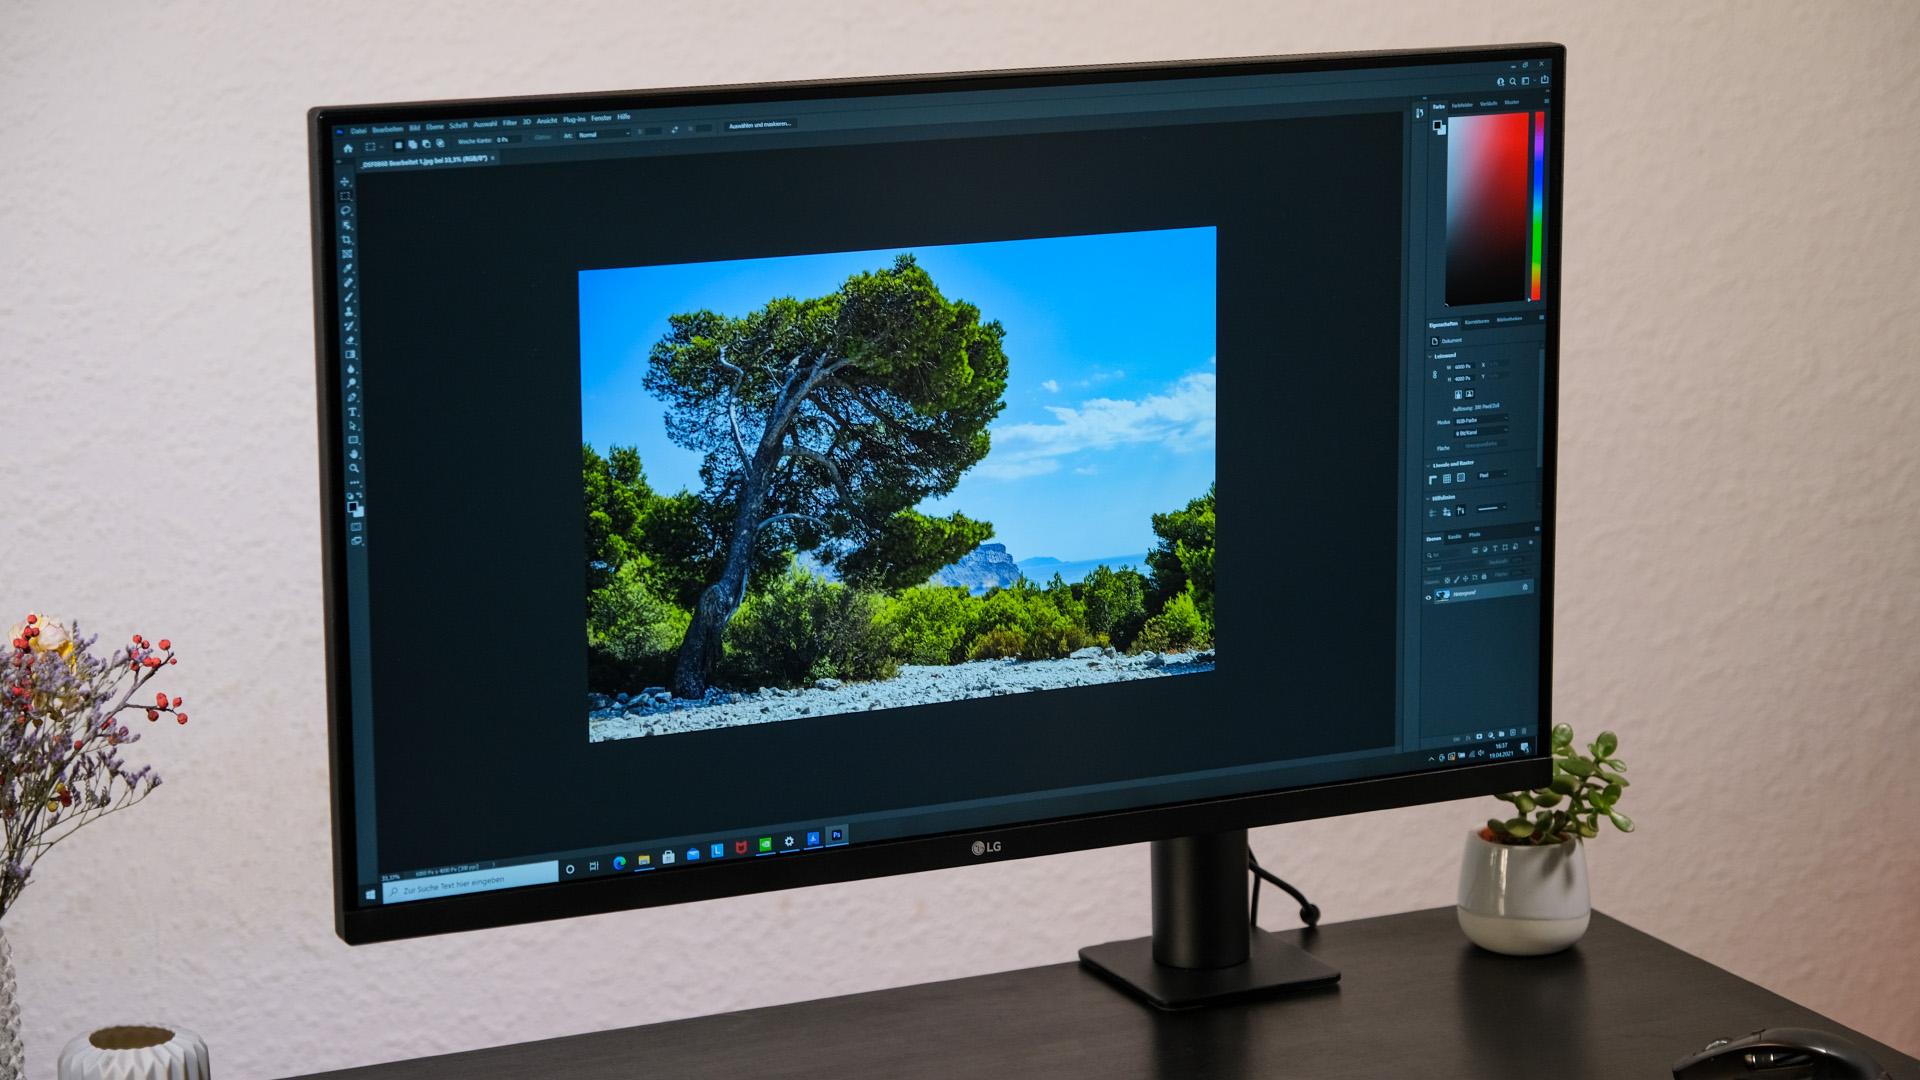 LG 32UN880-B Ergo Ultrafine Monitor Test Review Photoshop